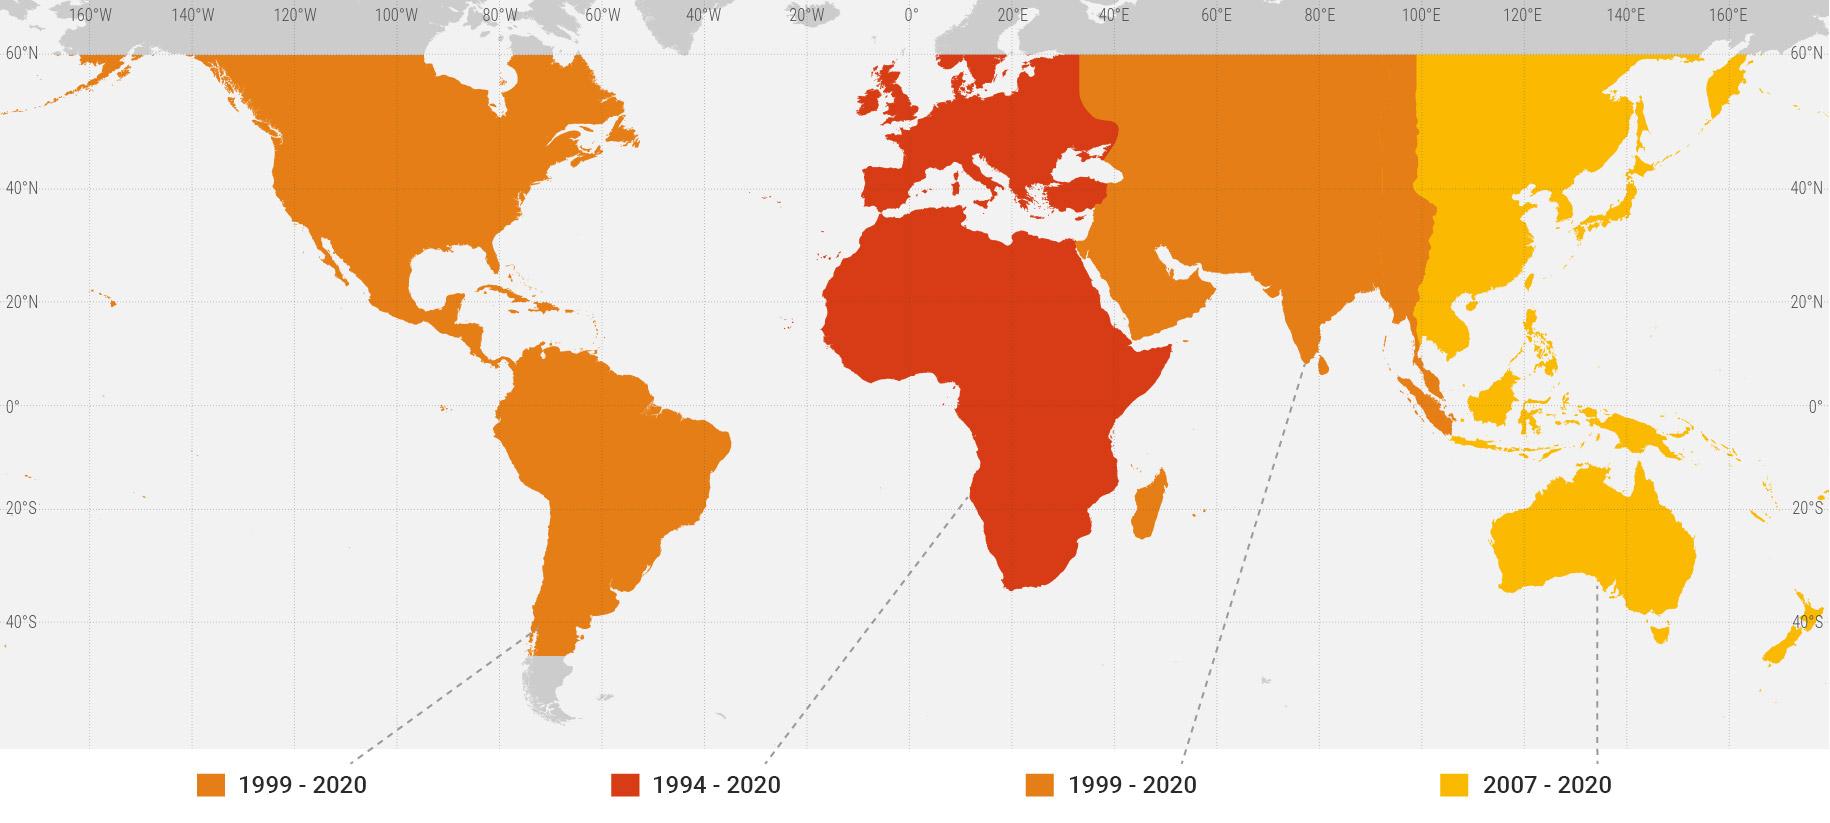 coverage map prospect v20212807